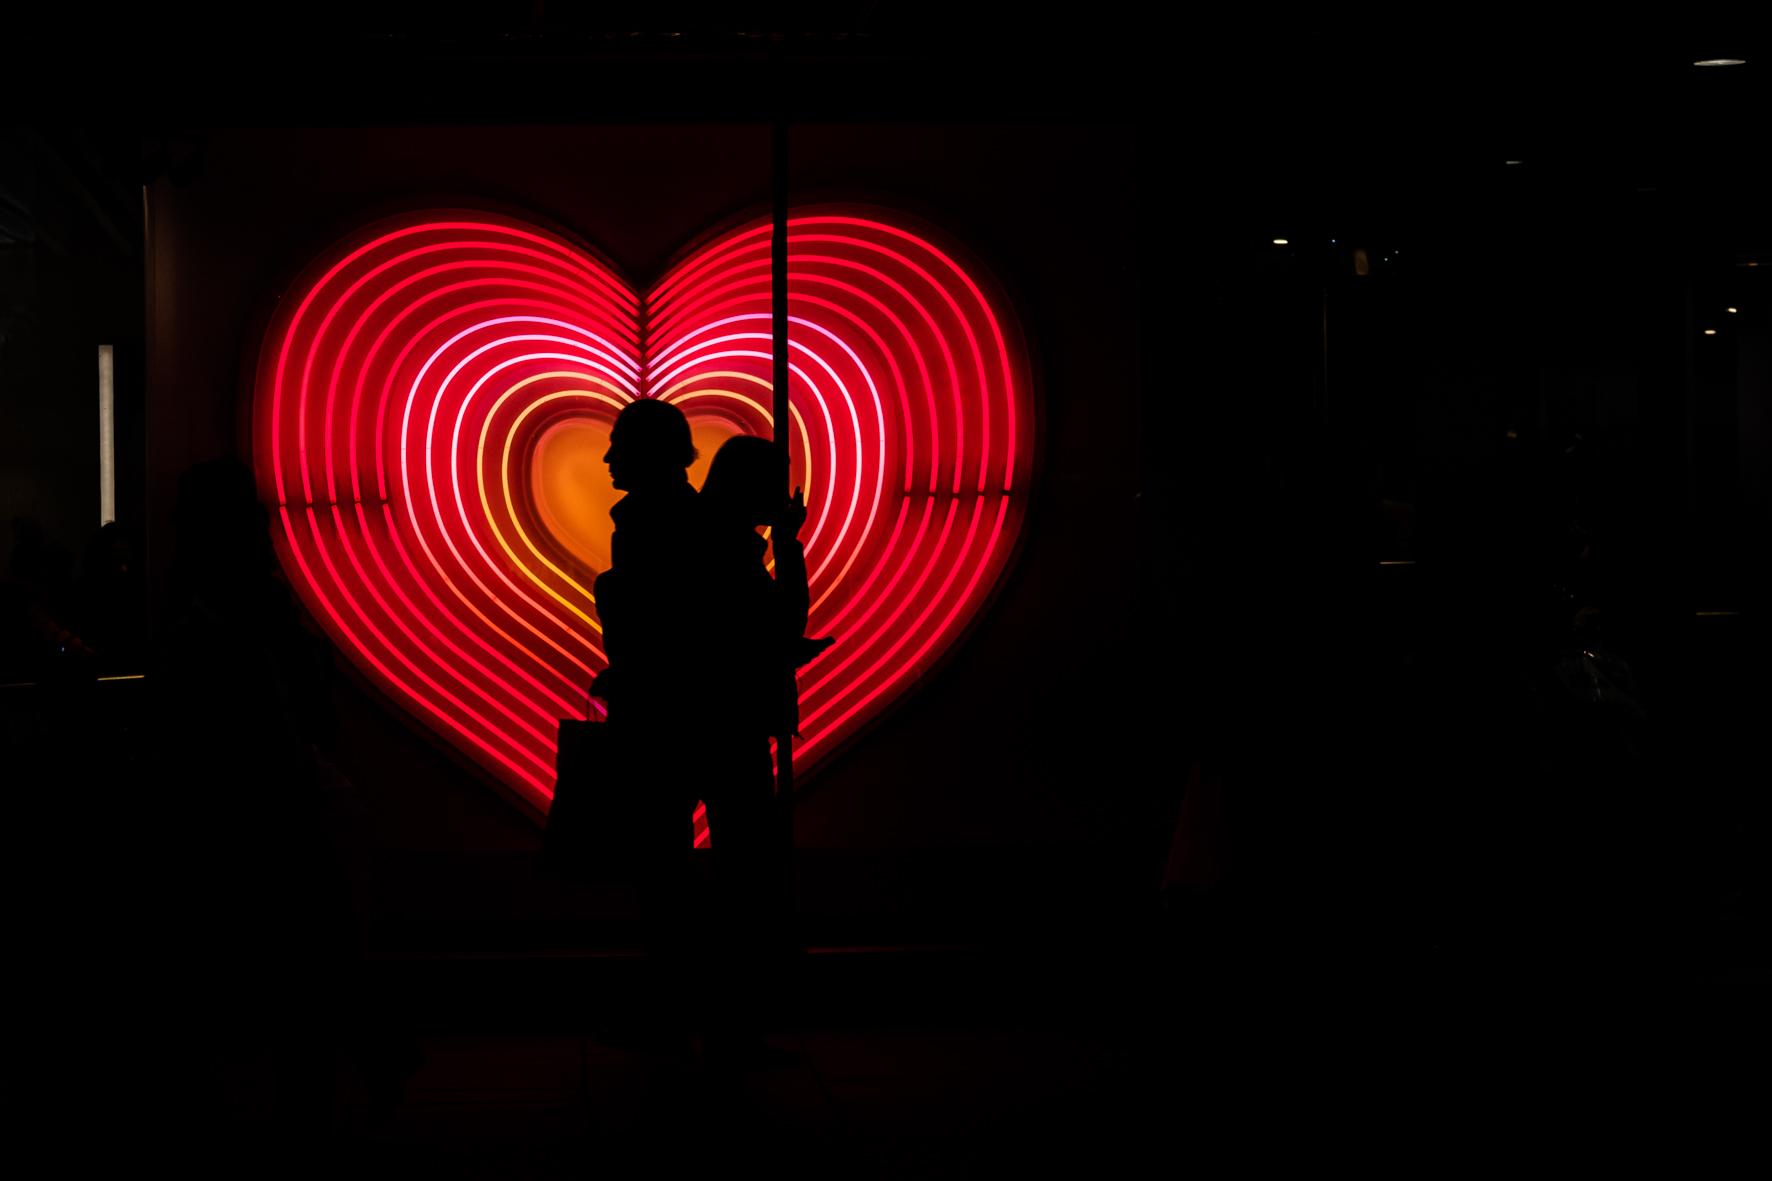 195. Two Hearts.jpg